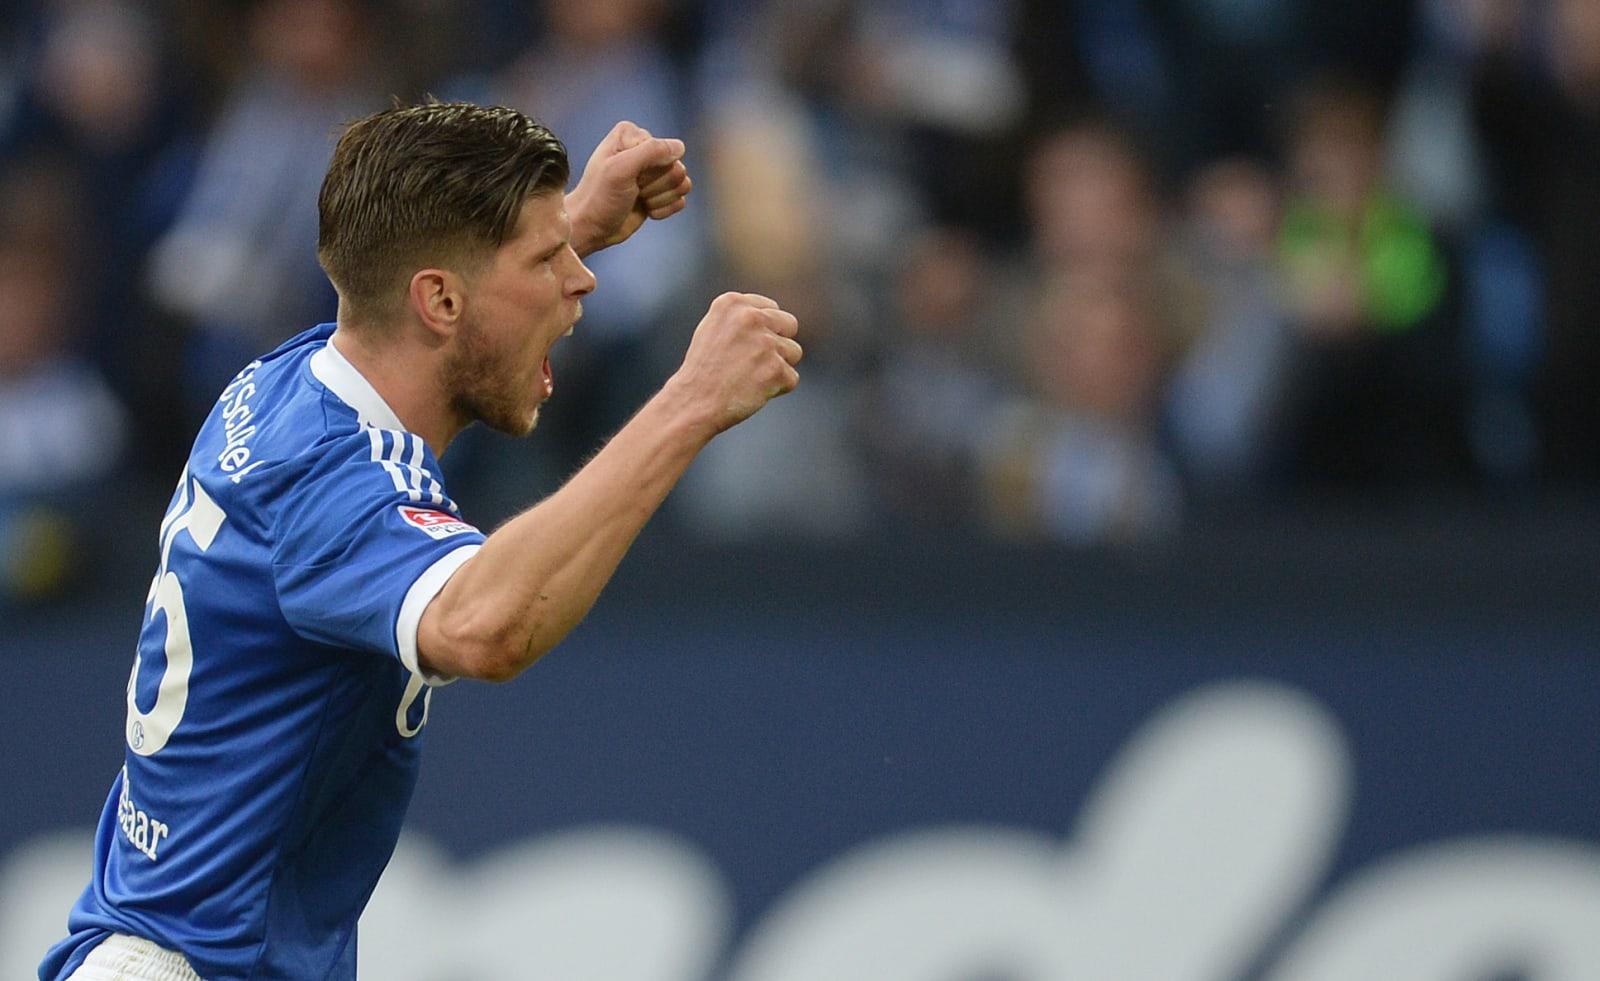 Schalke 04, Klaas-Jan Huntelaar